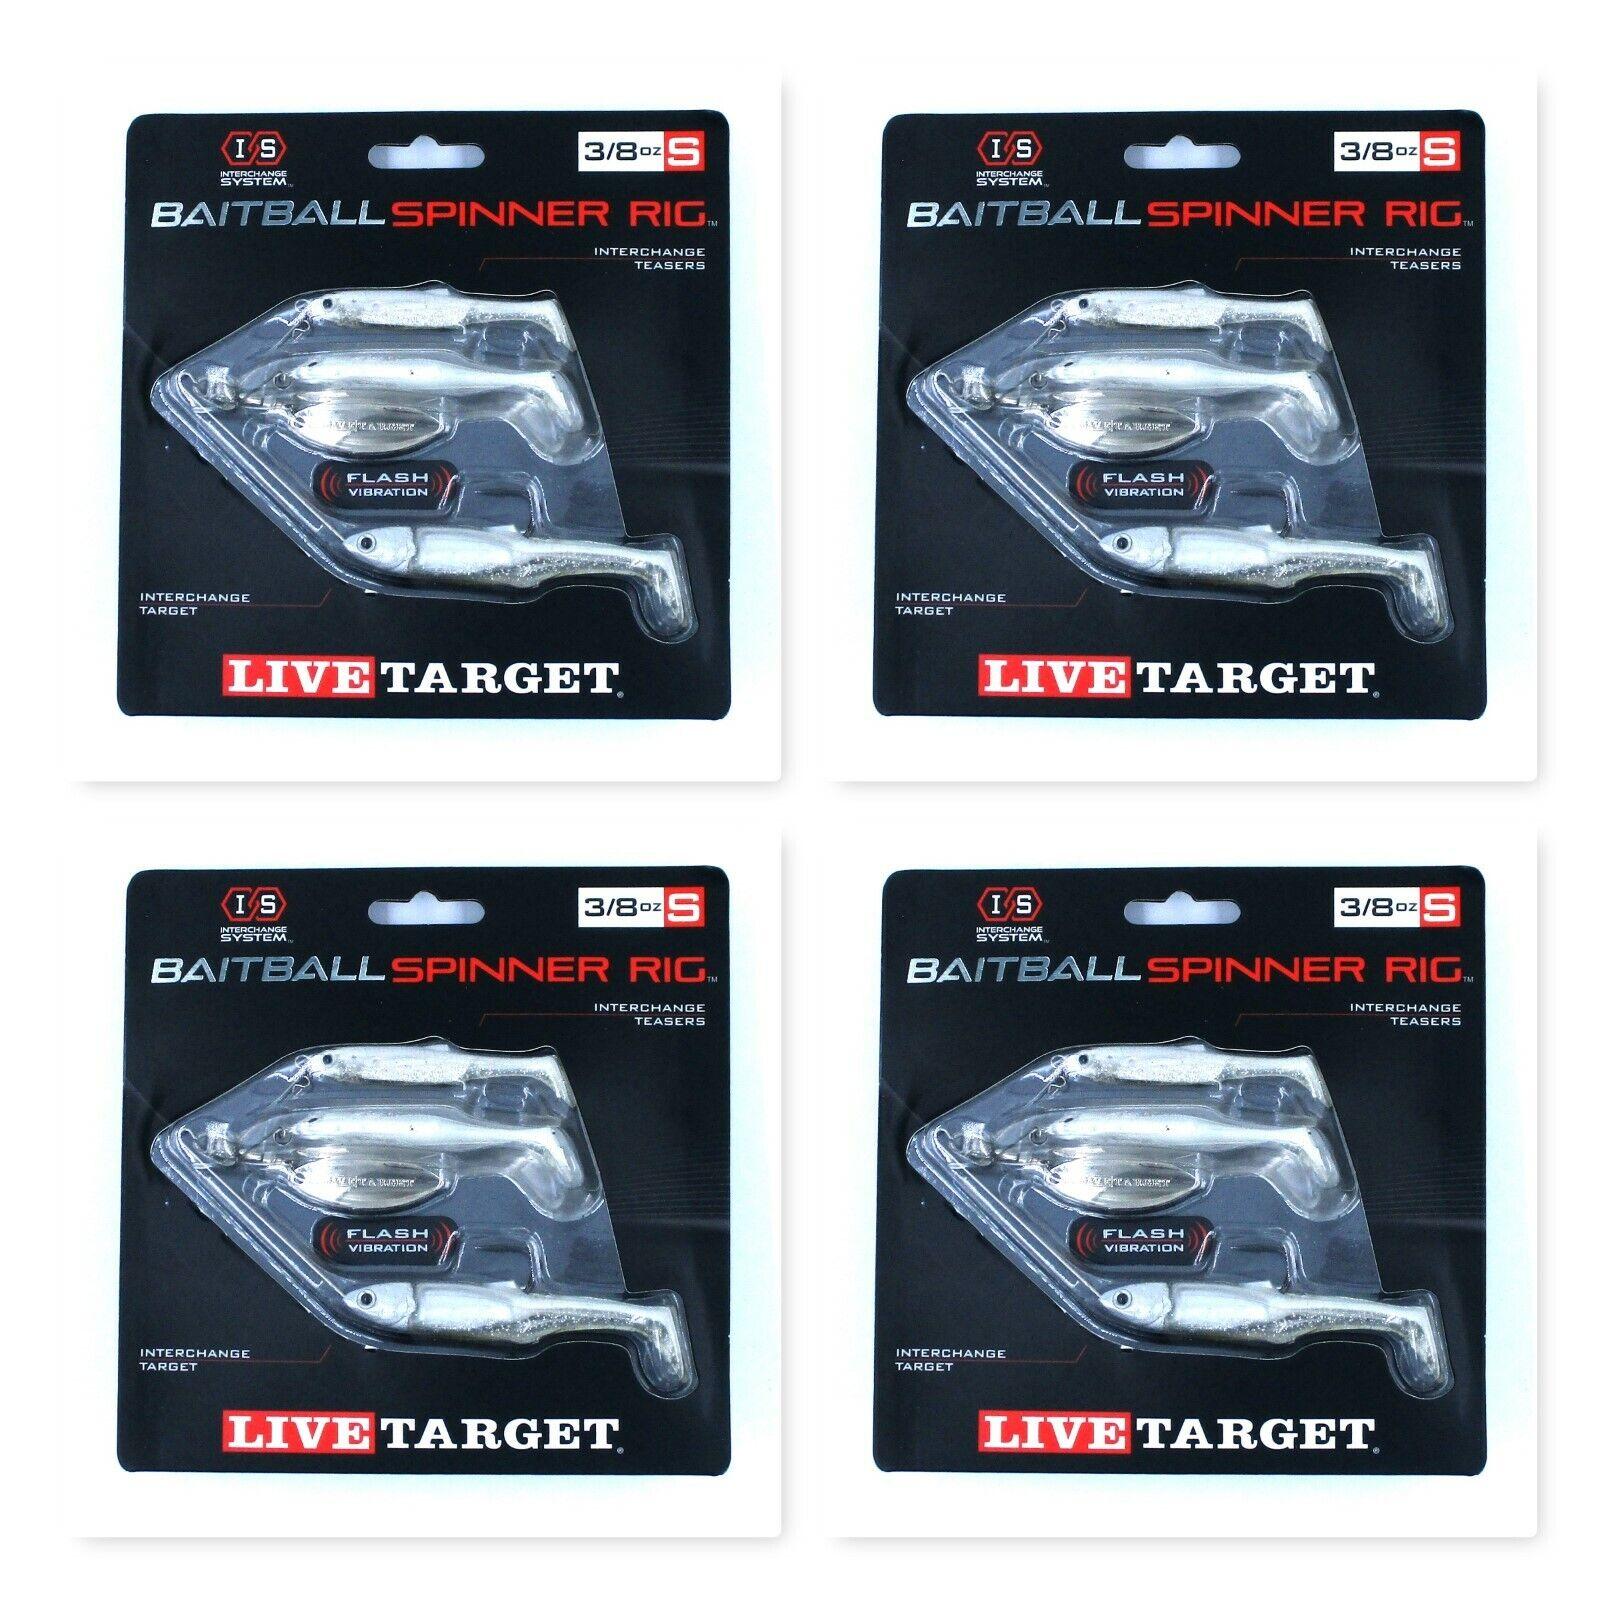 LIVETARGET Lures MNSR11SM851 Baitball Small Spinner Rig Prpl Pearl//silver 3//8oz for sale online